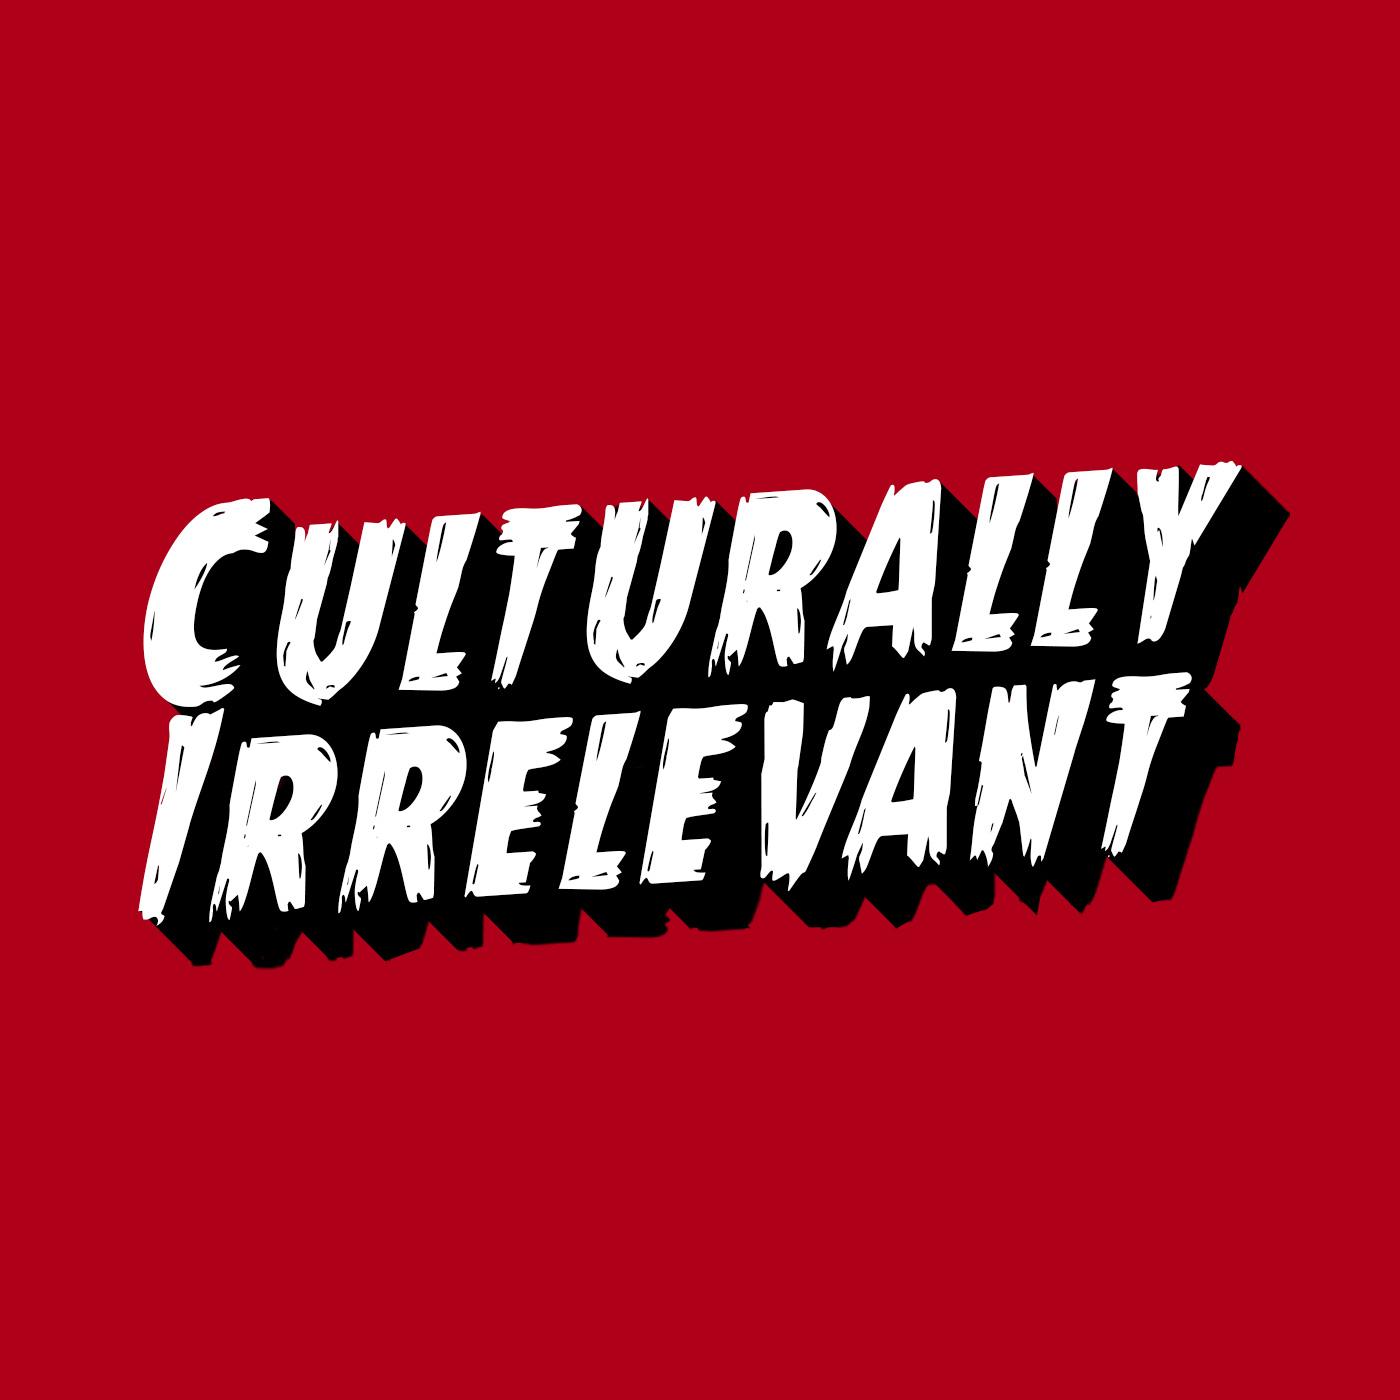 Culturally Irrelevant